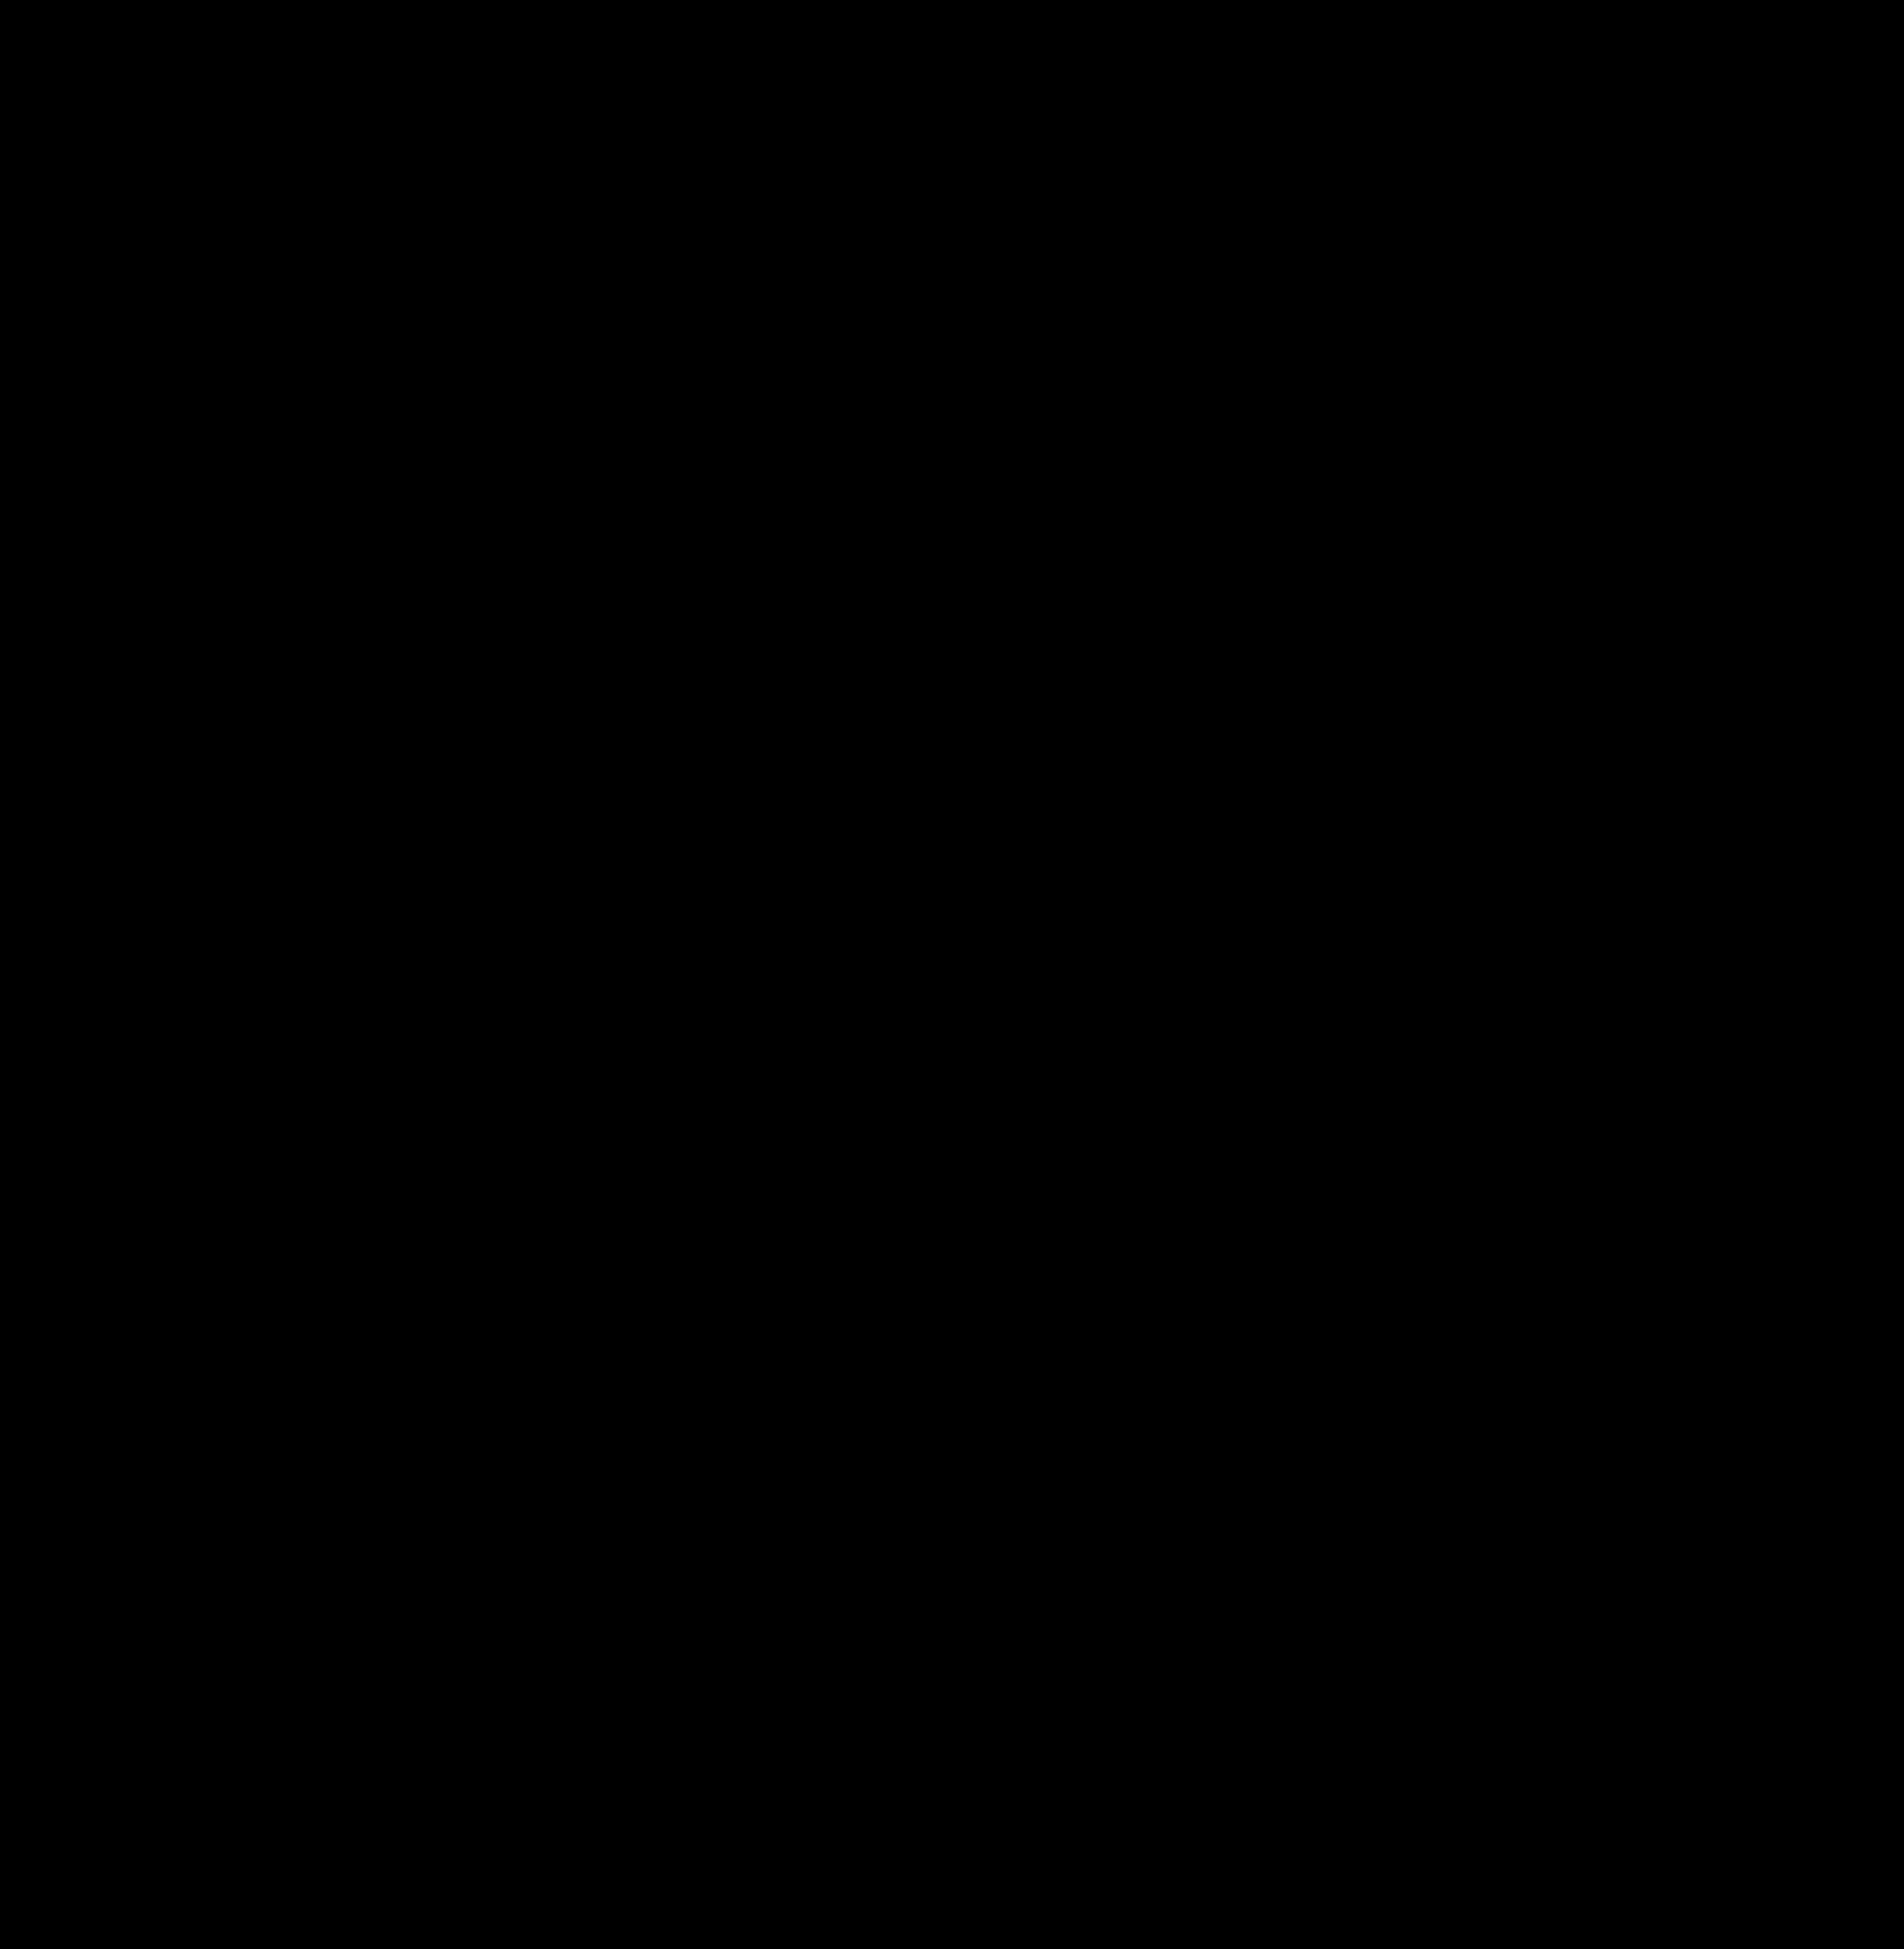 PNG Footprint - 154345